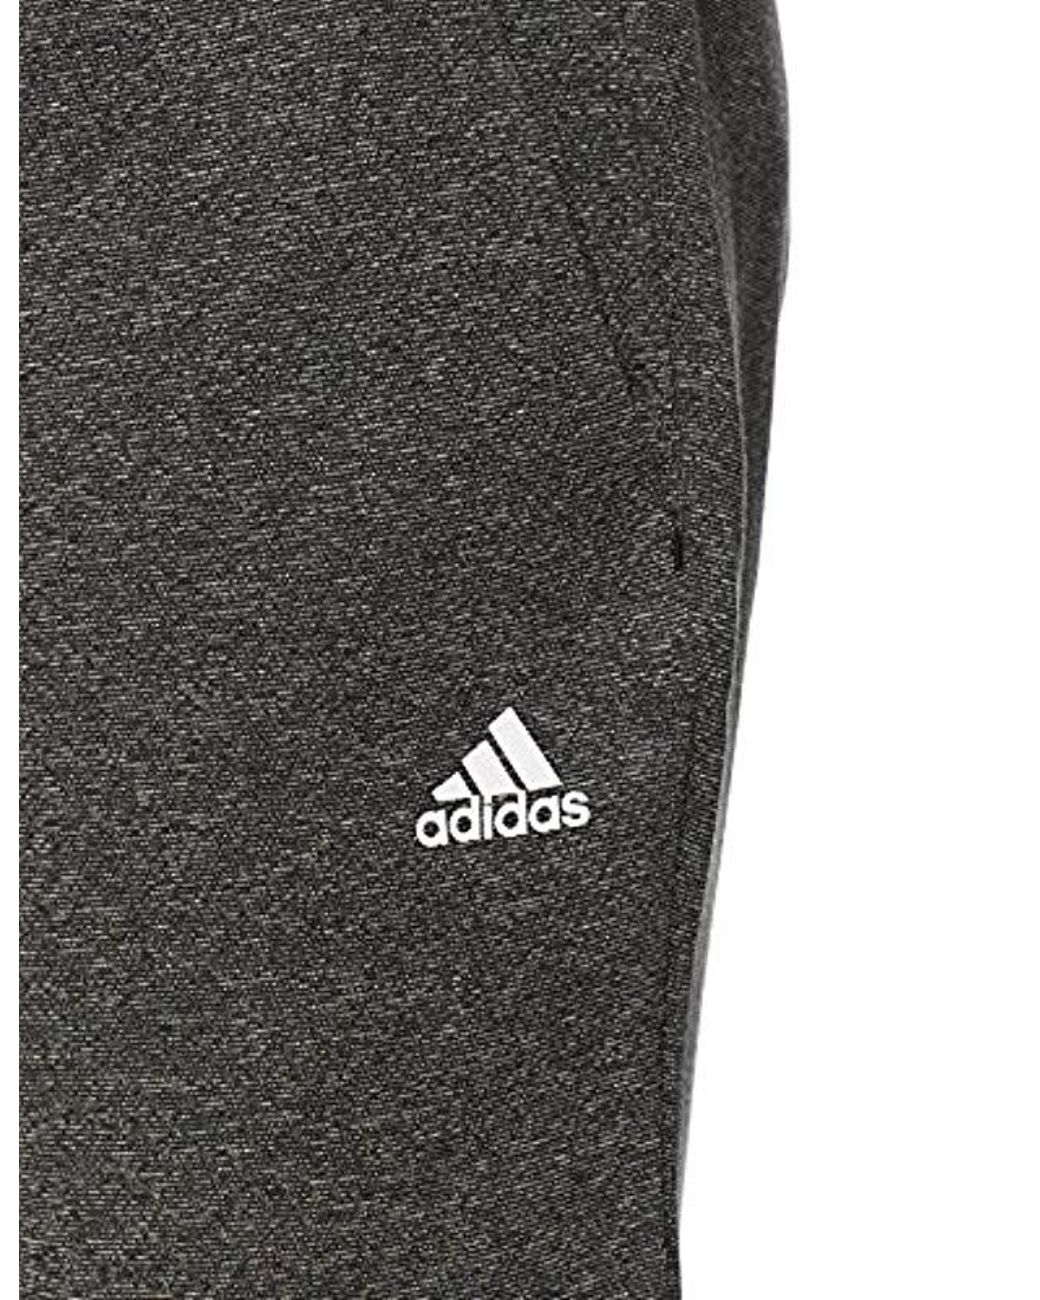 b80931919ef14 adidas M Id Stadium Sh Sports Shorts in Black for Men - Lyst